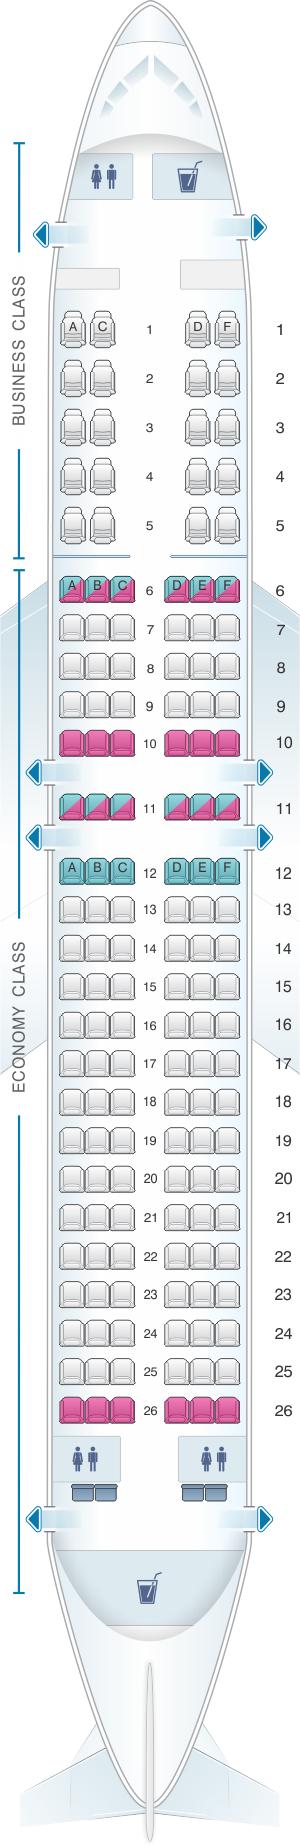 Seat map for White Airways Boeing B737 800